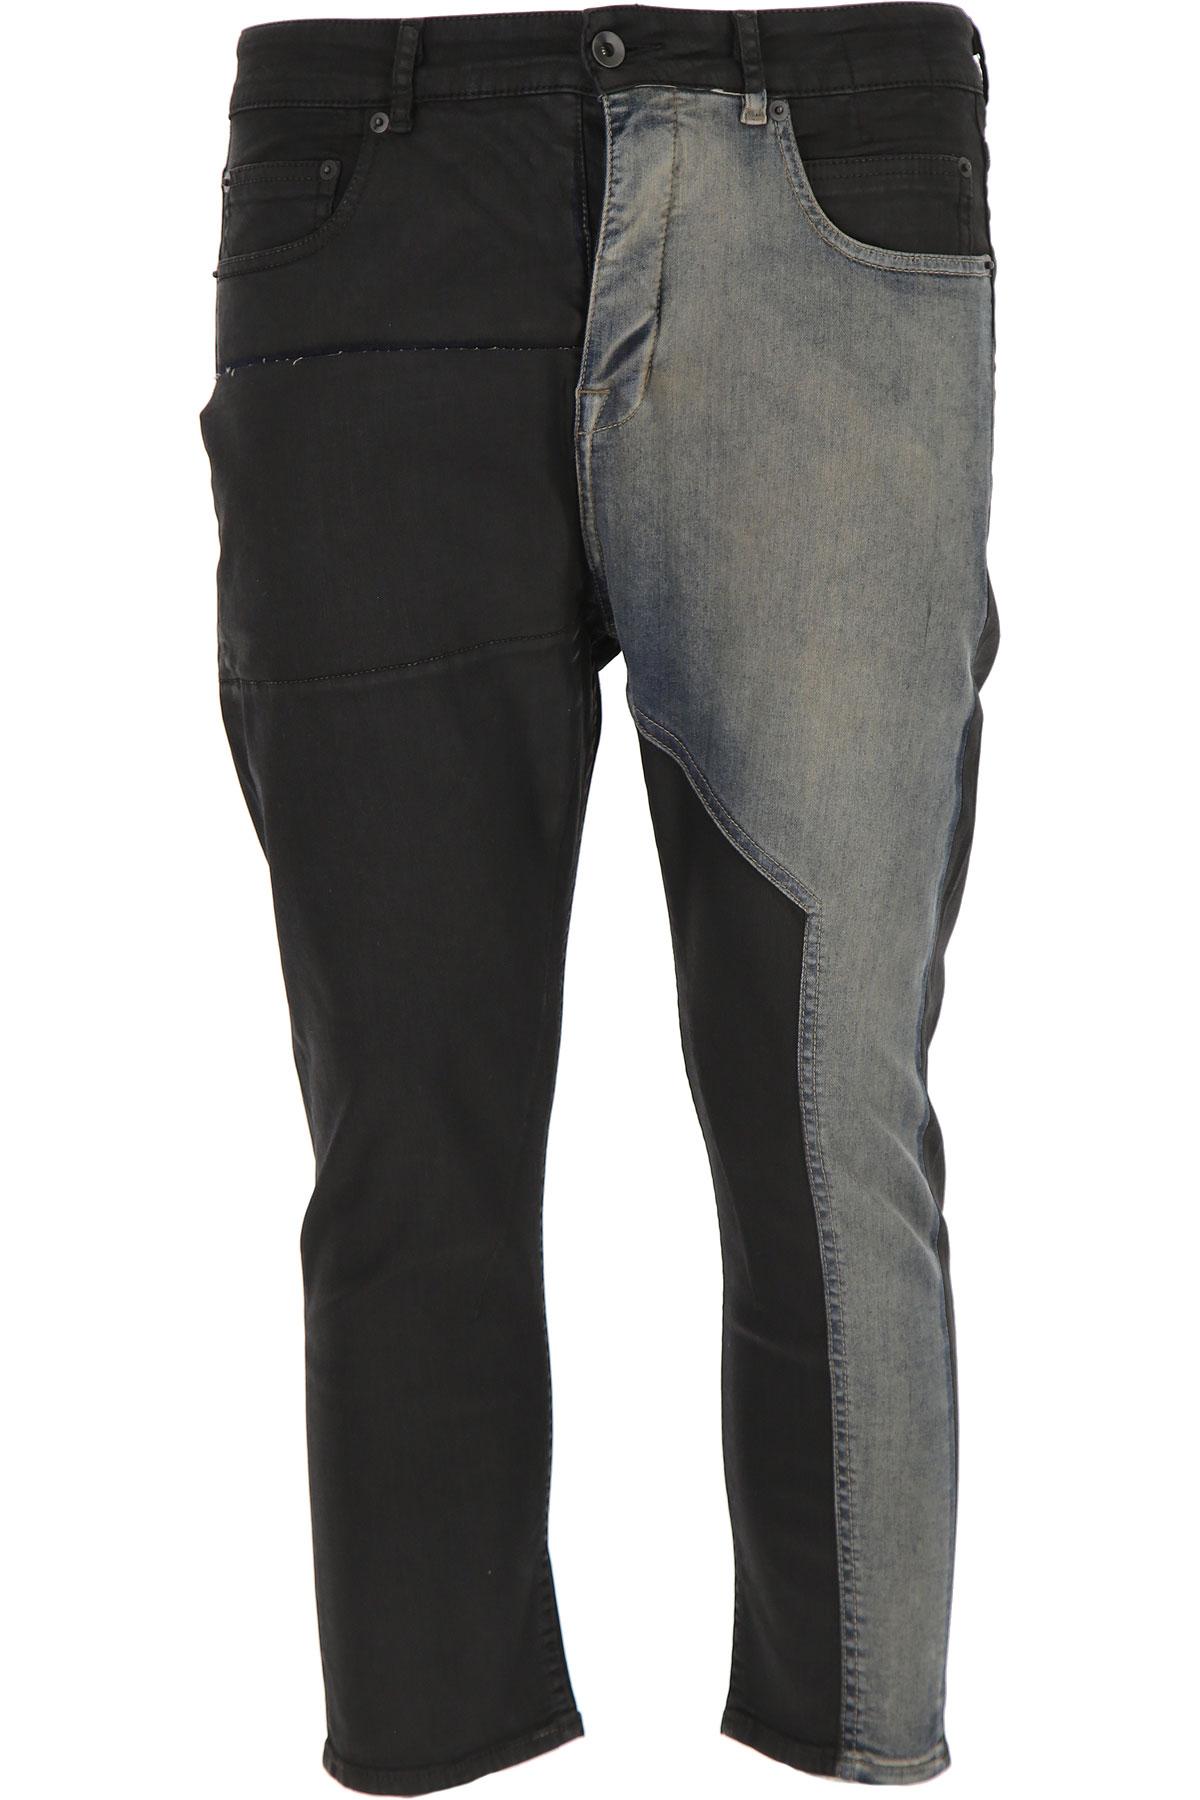 Rick Owens DRKSHDW Jeans On Sale in Outlet, Black, Cotton, 2019, 31 32 33